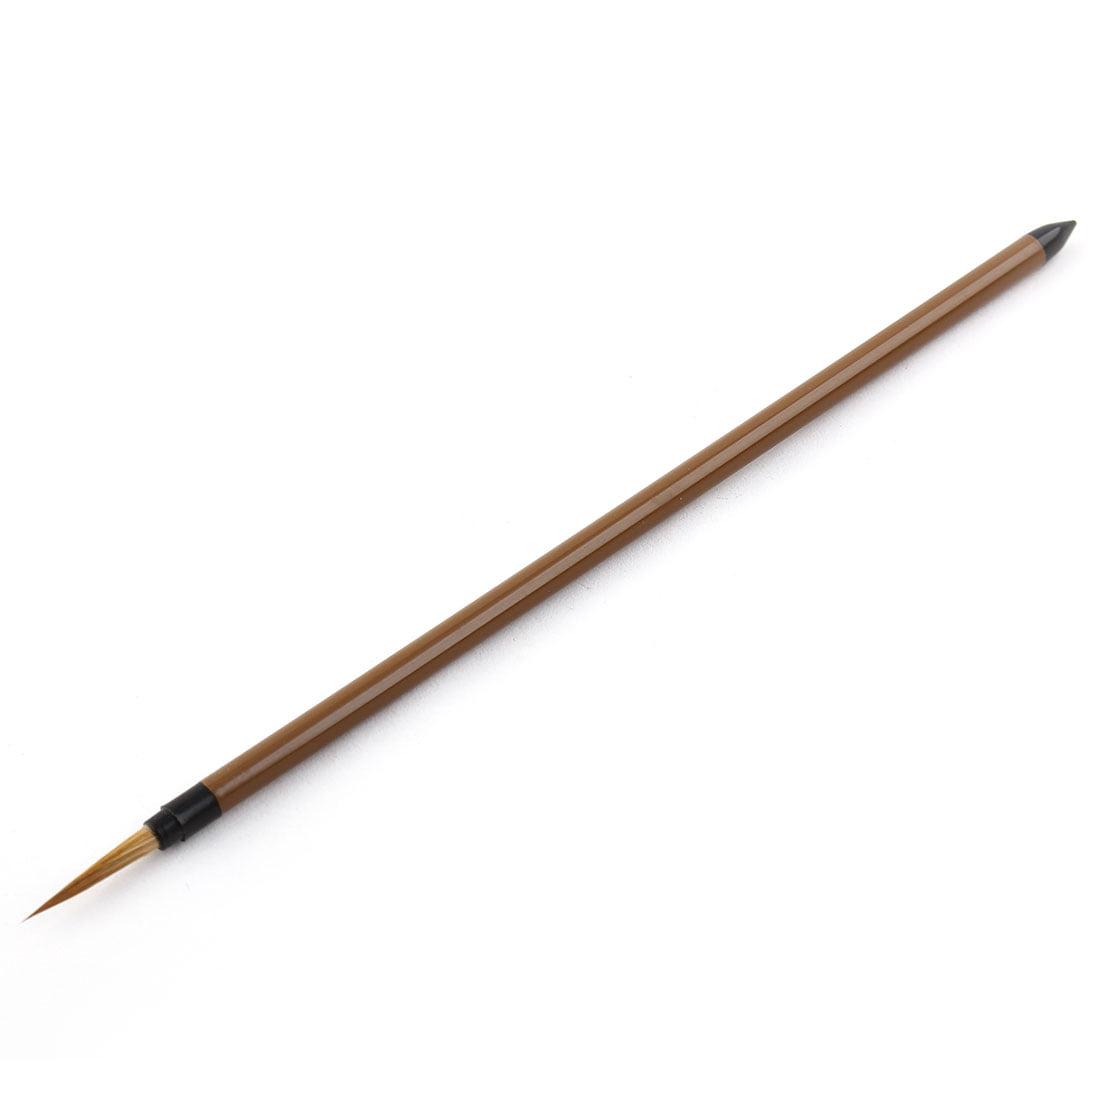 Artist Acrylic Painting Nylon Hair Wooden Handle #2 Detail Paint Brush Brown - image 5 de 5